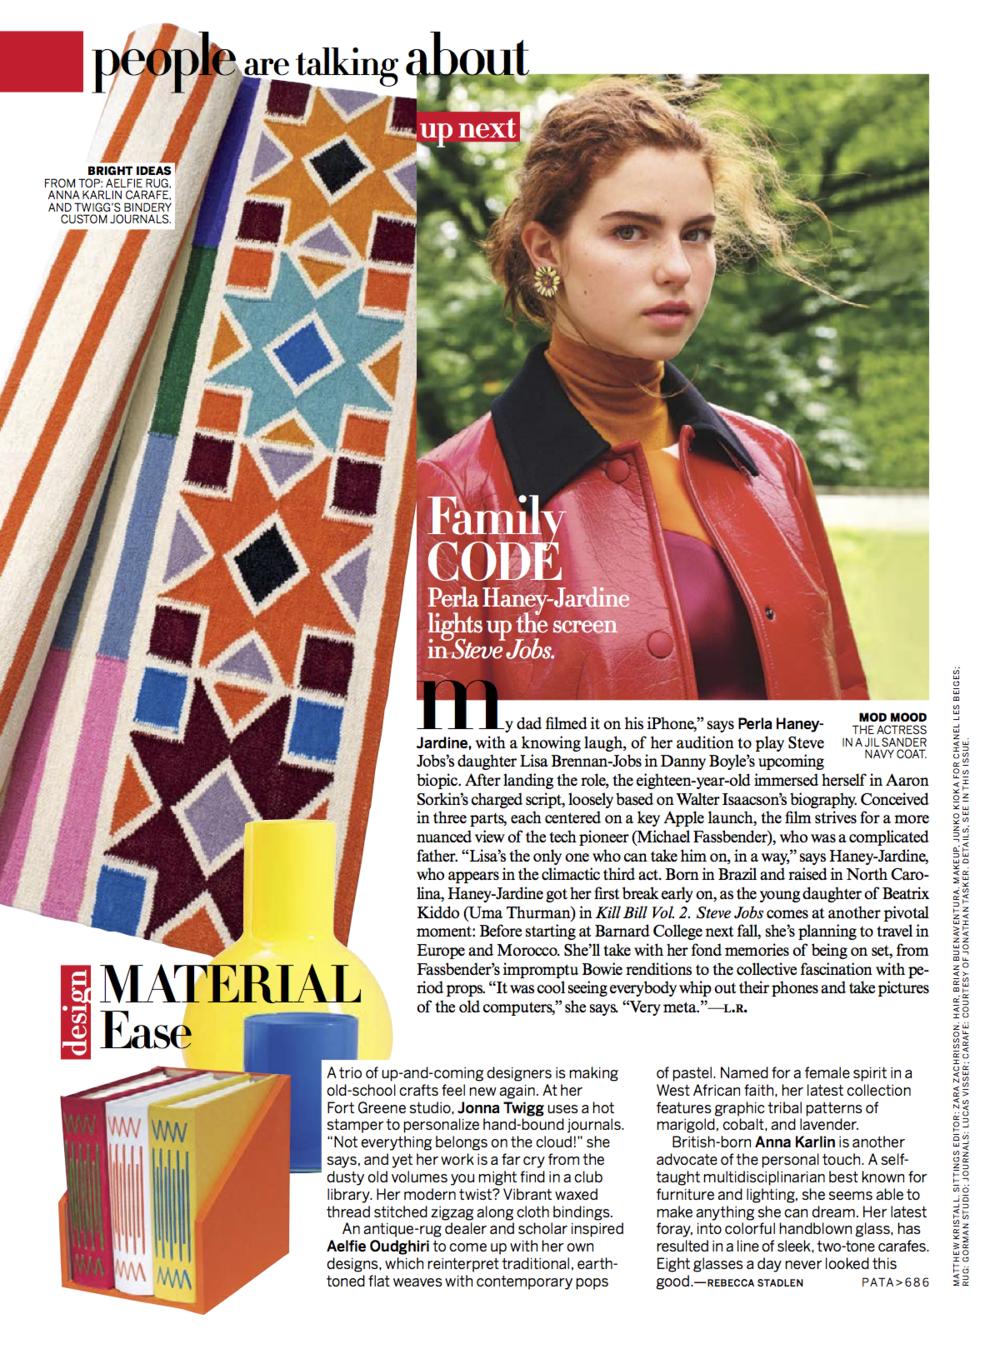 Vogue, September 2015